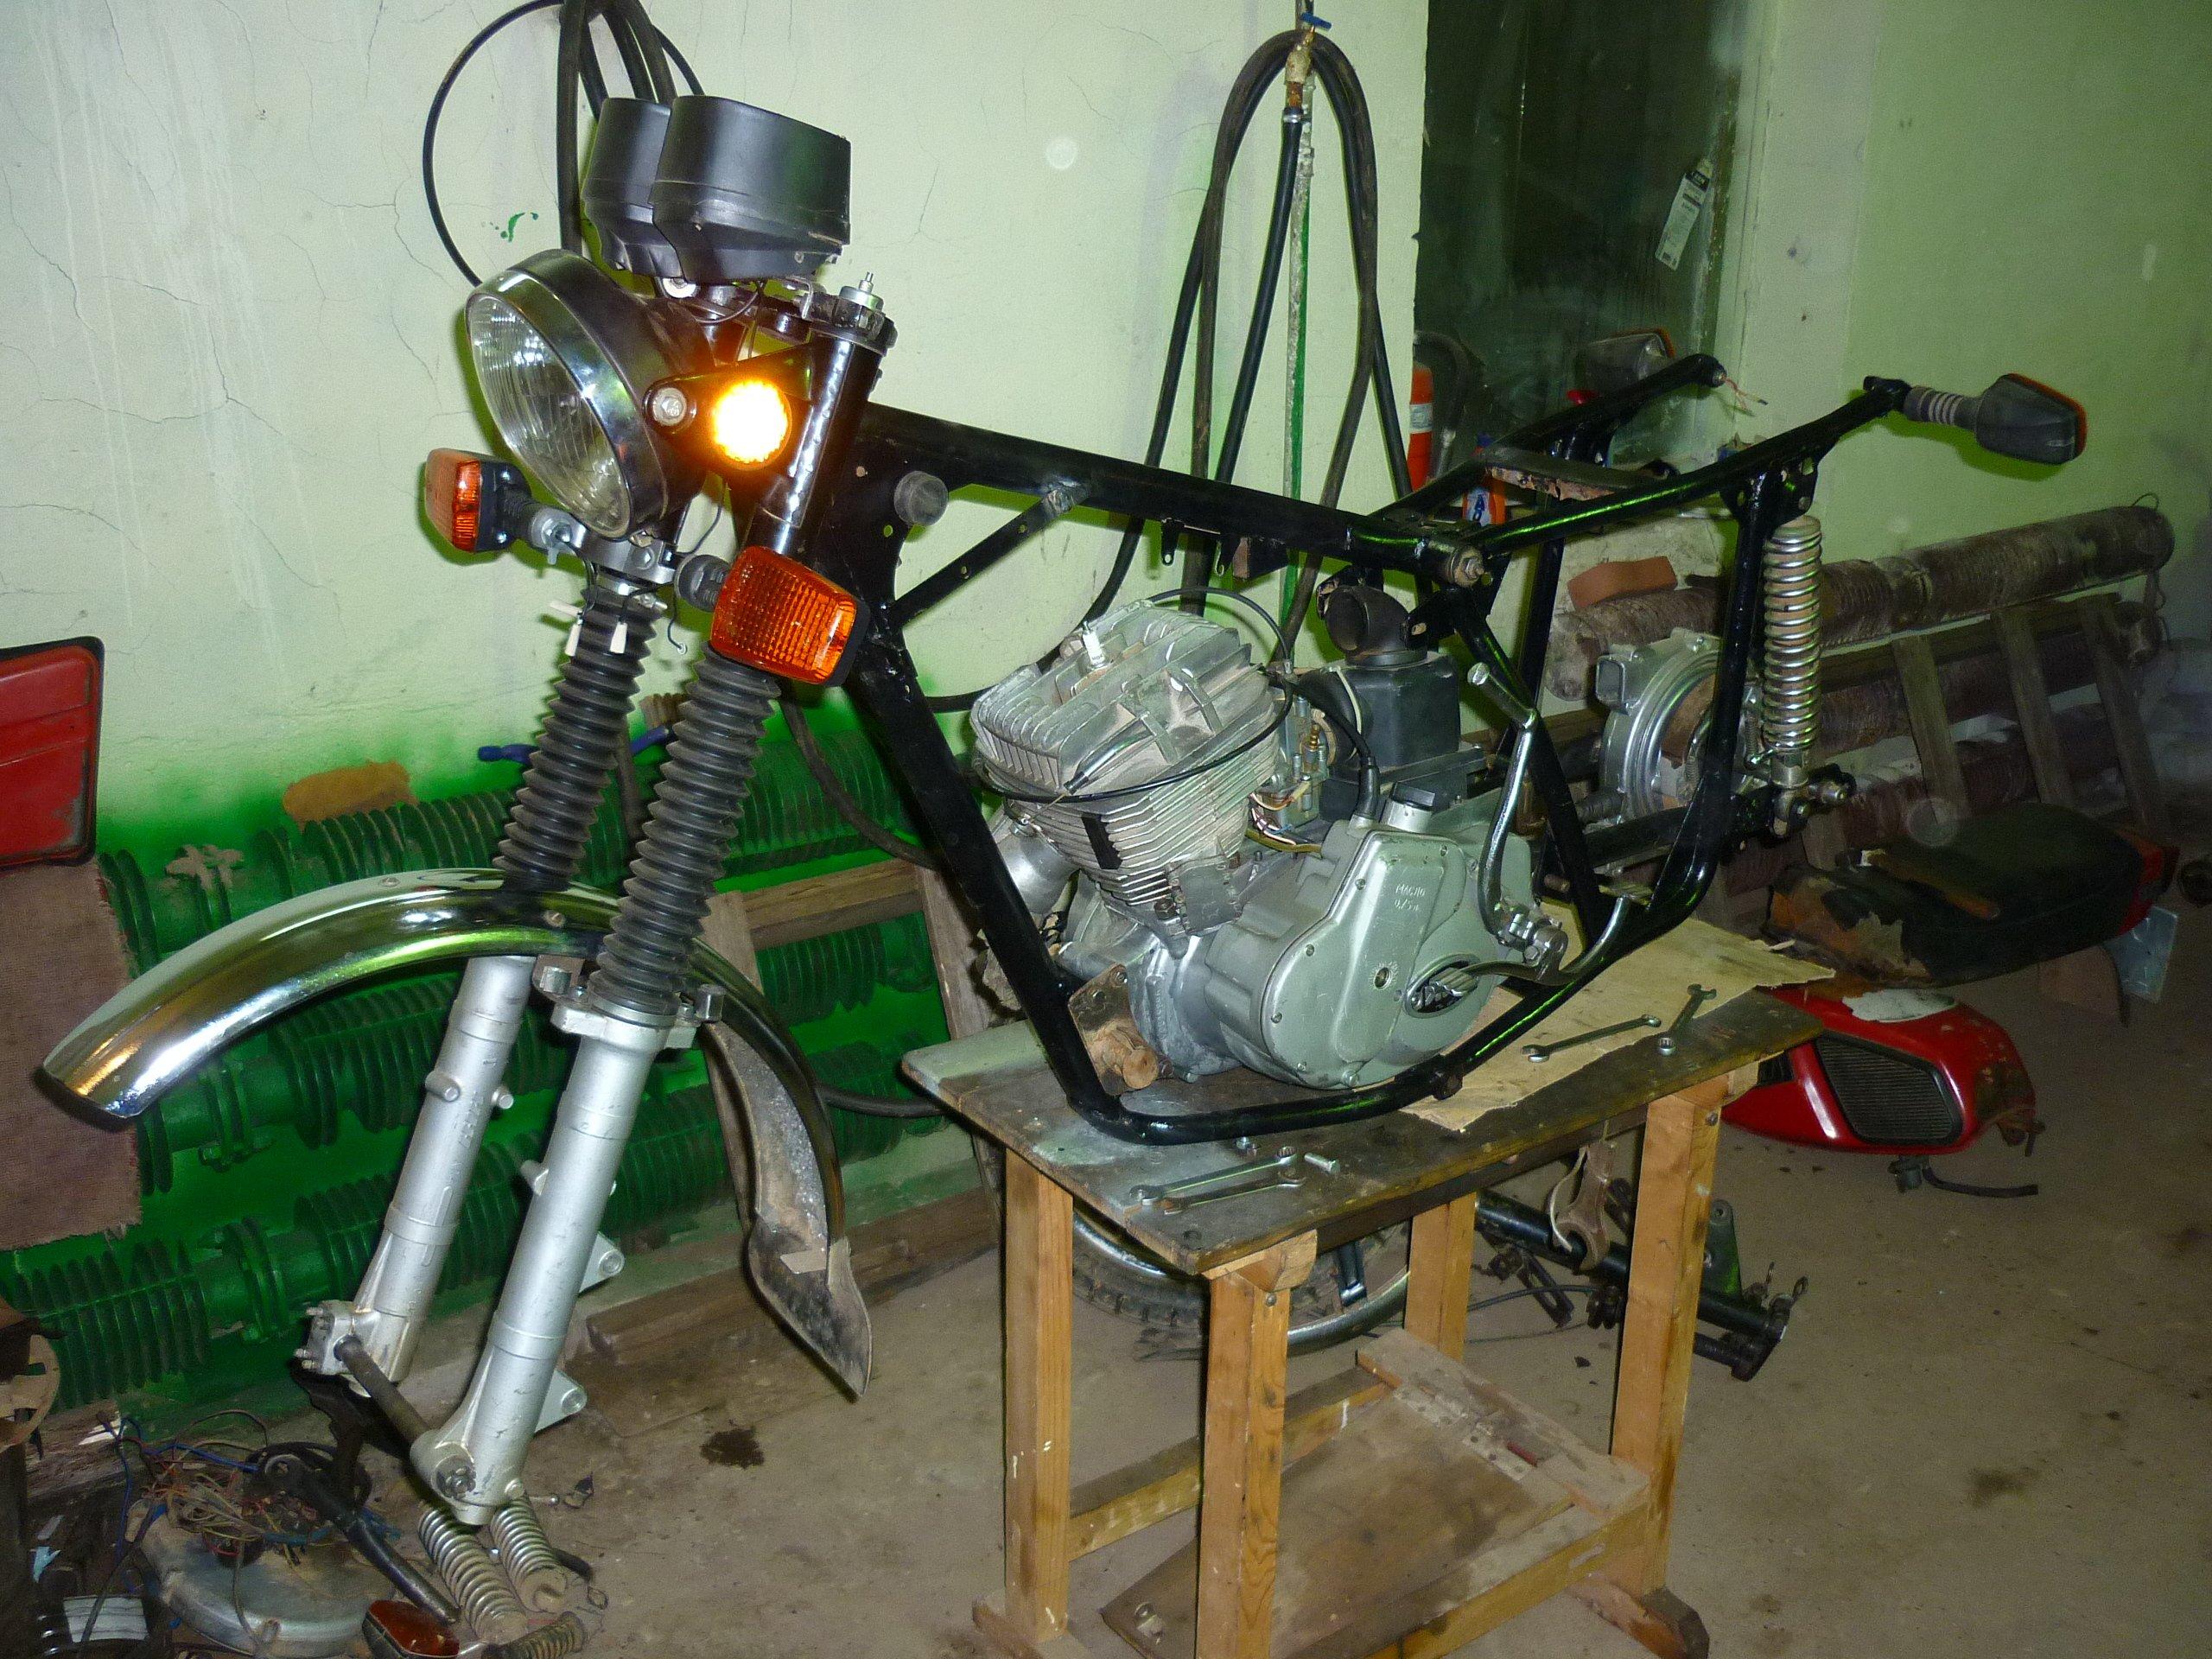 Ремонт мотоциклов своими руками